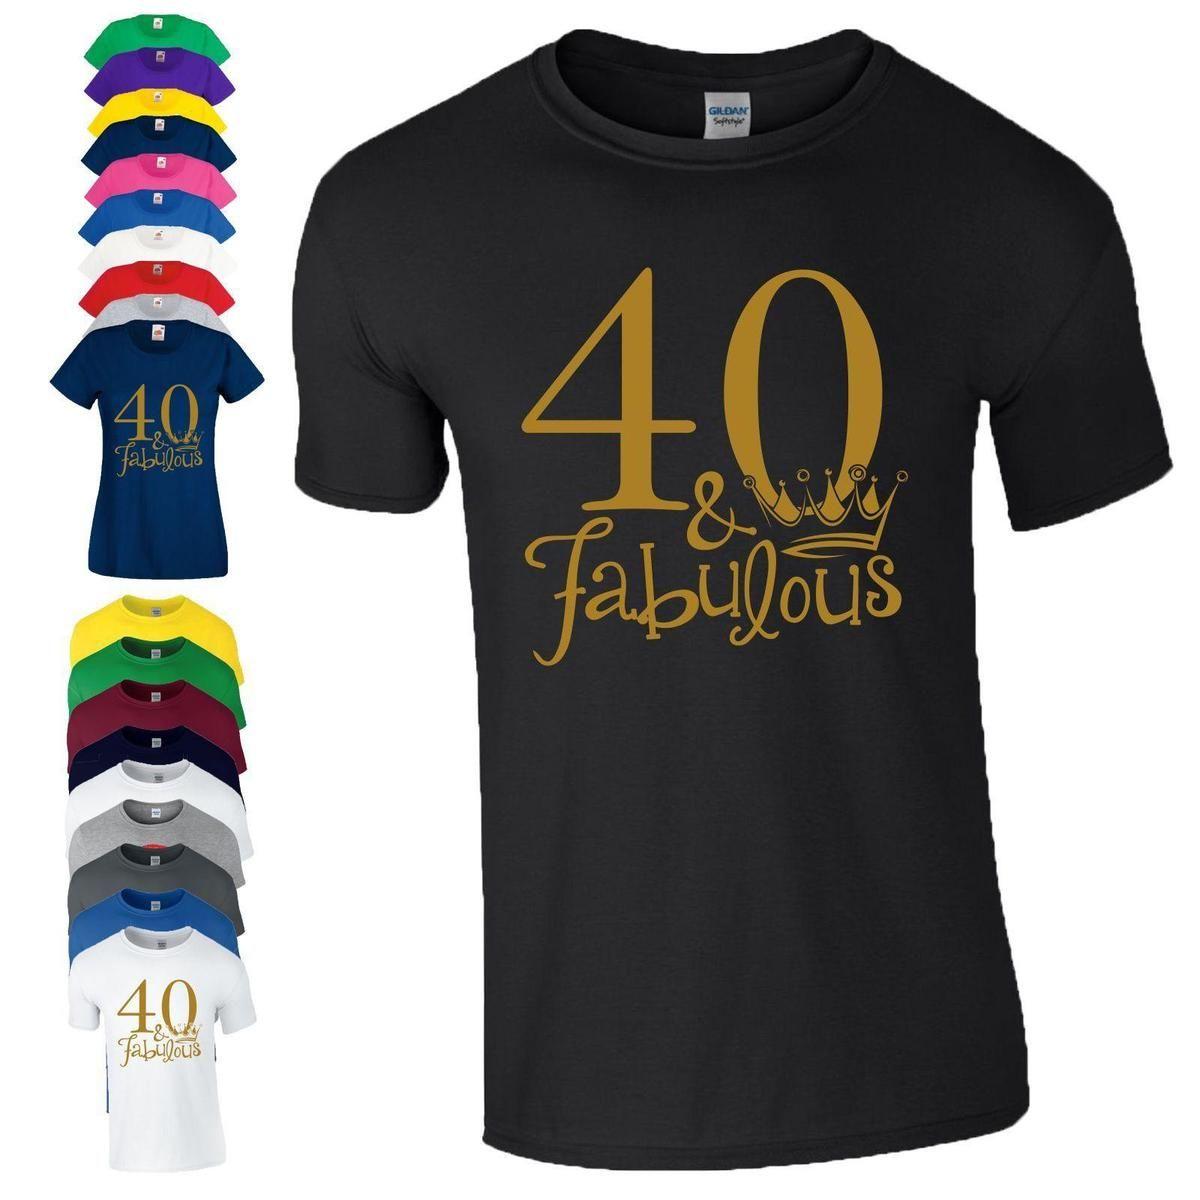 40th Birthday Gift T Shirt Made In 1978 King Queen 40 Fabulous Crown Mens Ladies Funky Shirts Online From Zhangjingxin39 1187